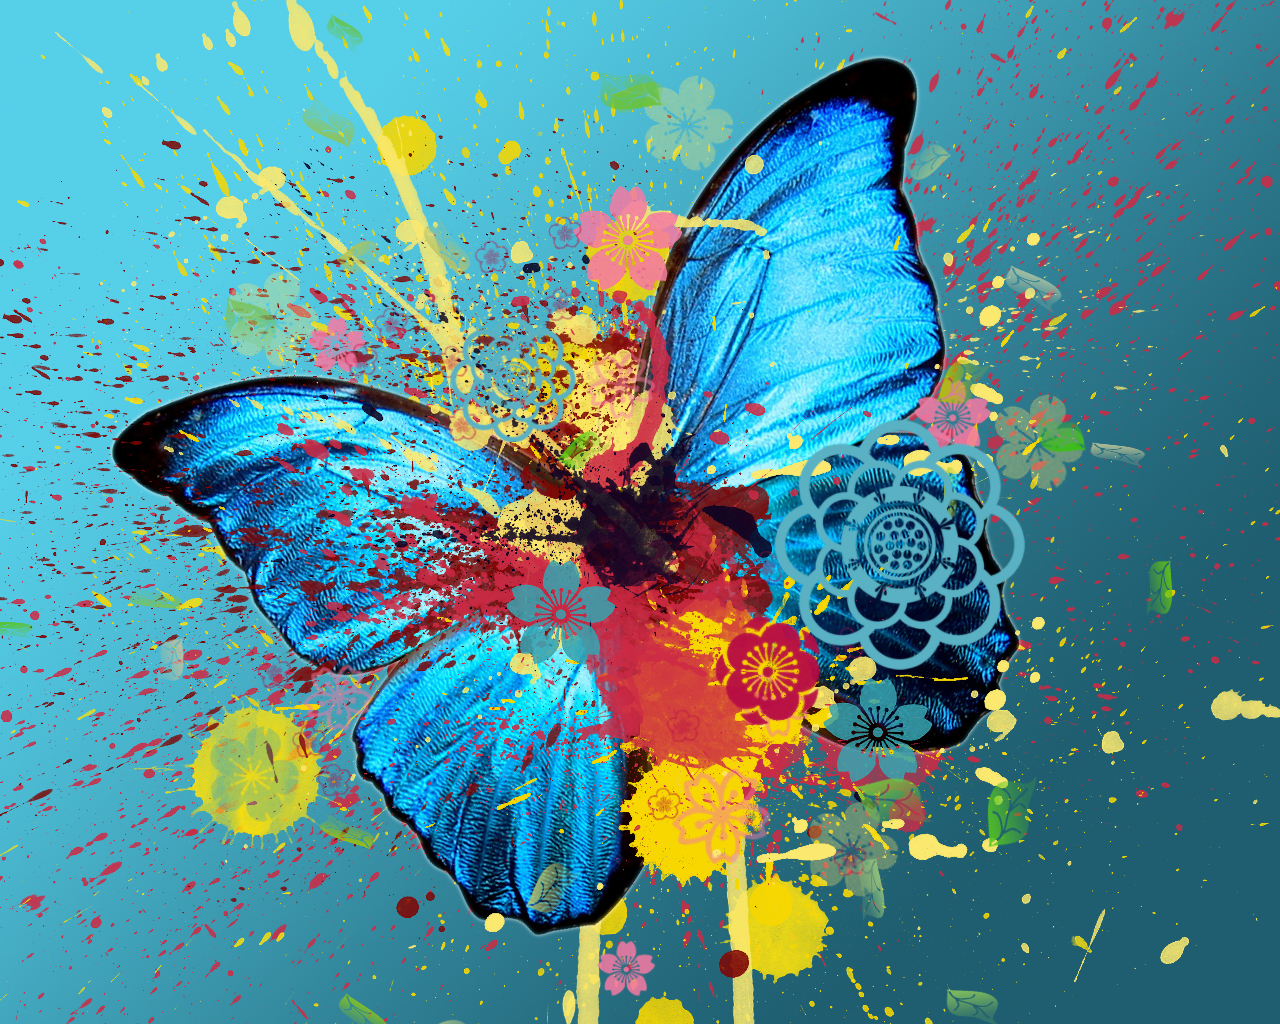 Butterfly wallpaper butterfly background wallpapers for Butterfly wallpaper